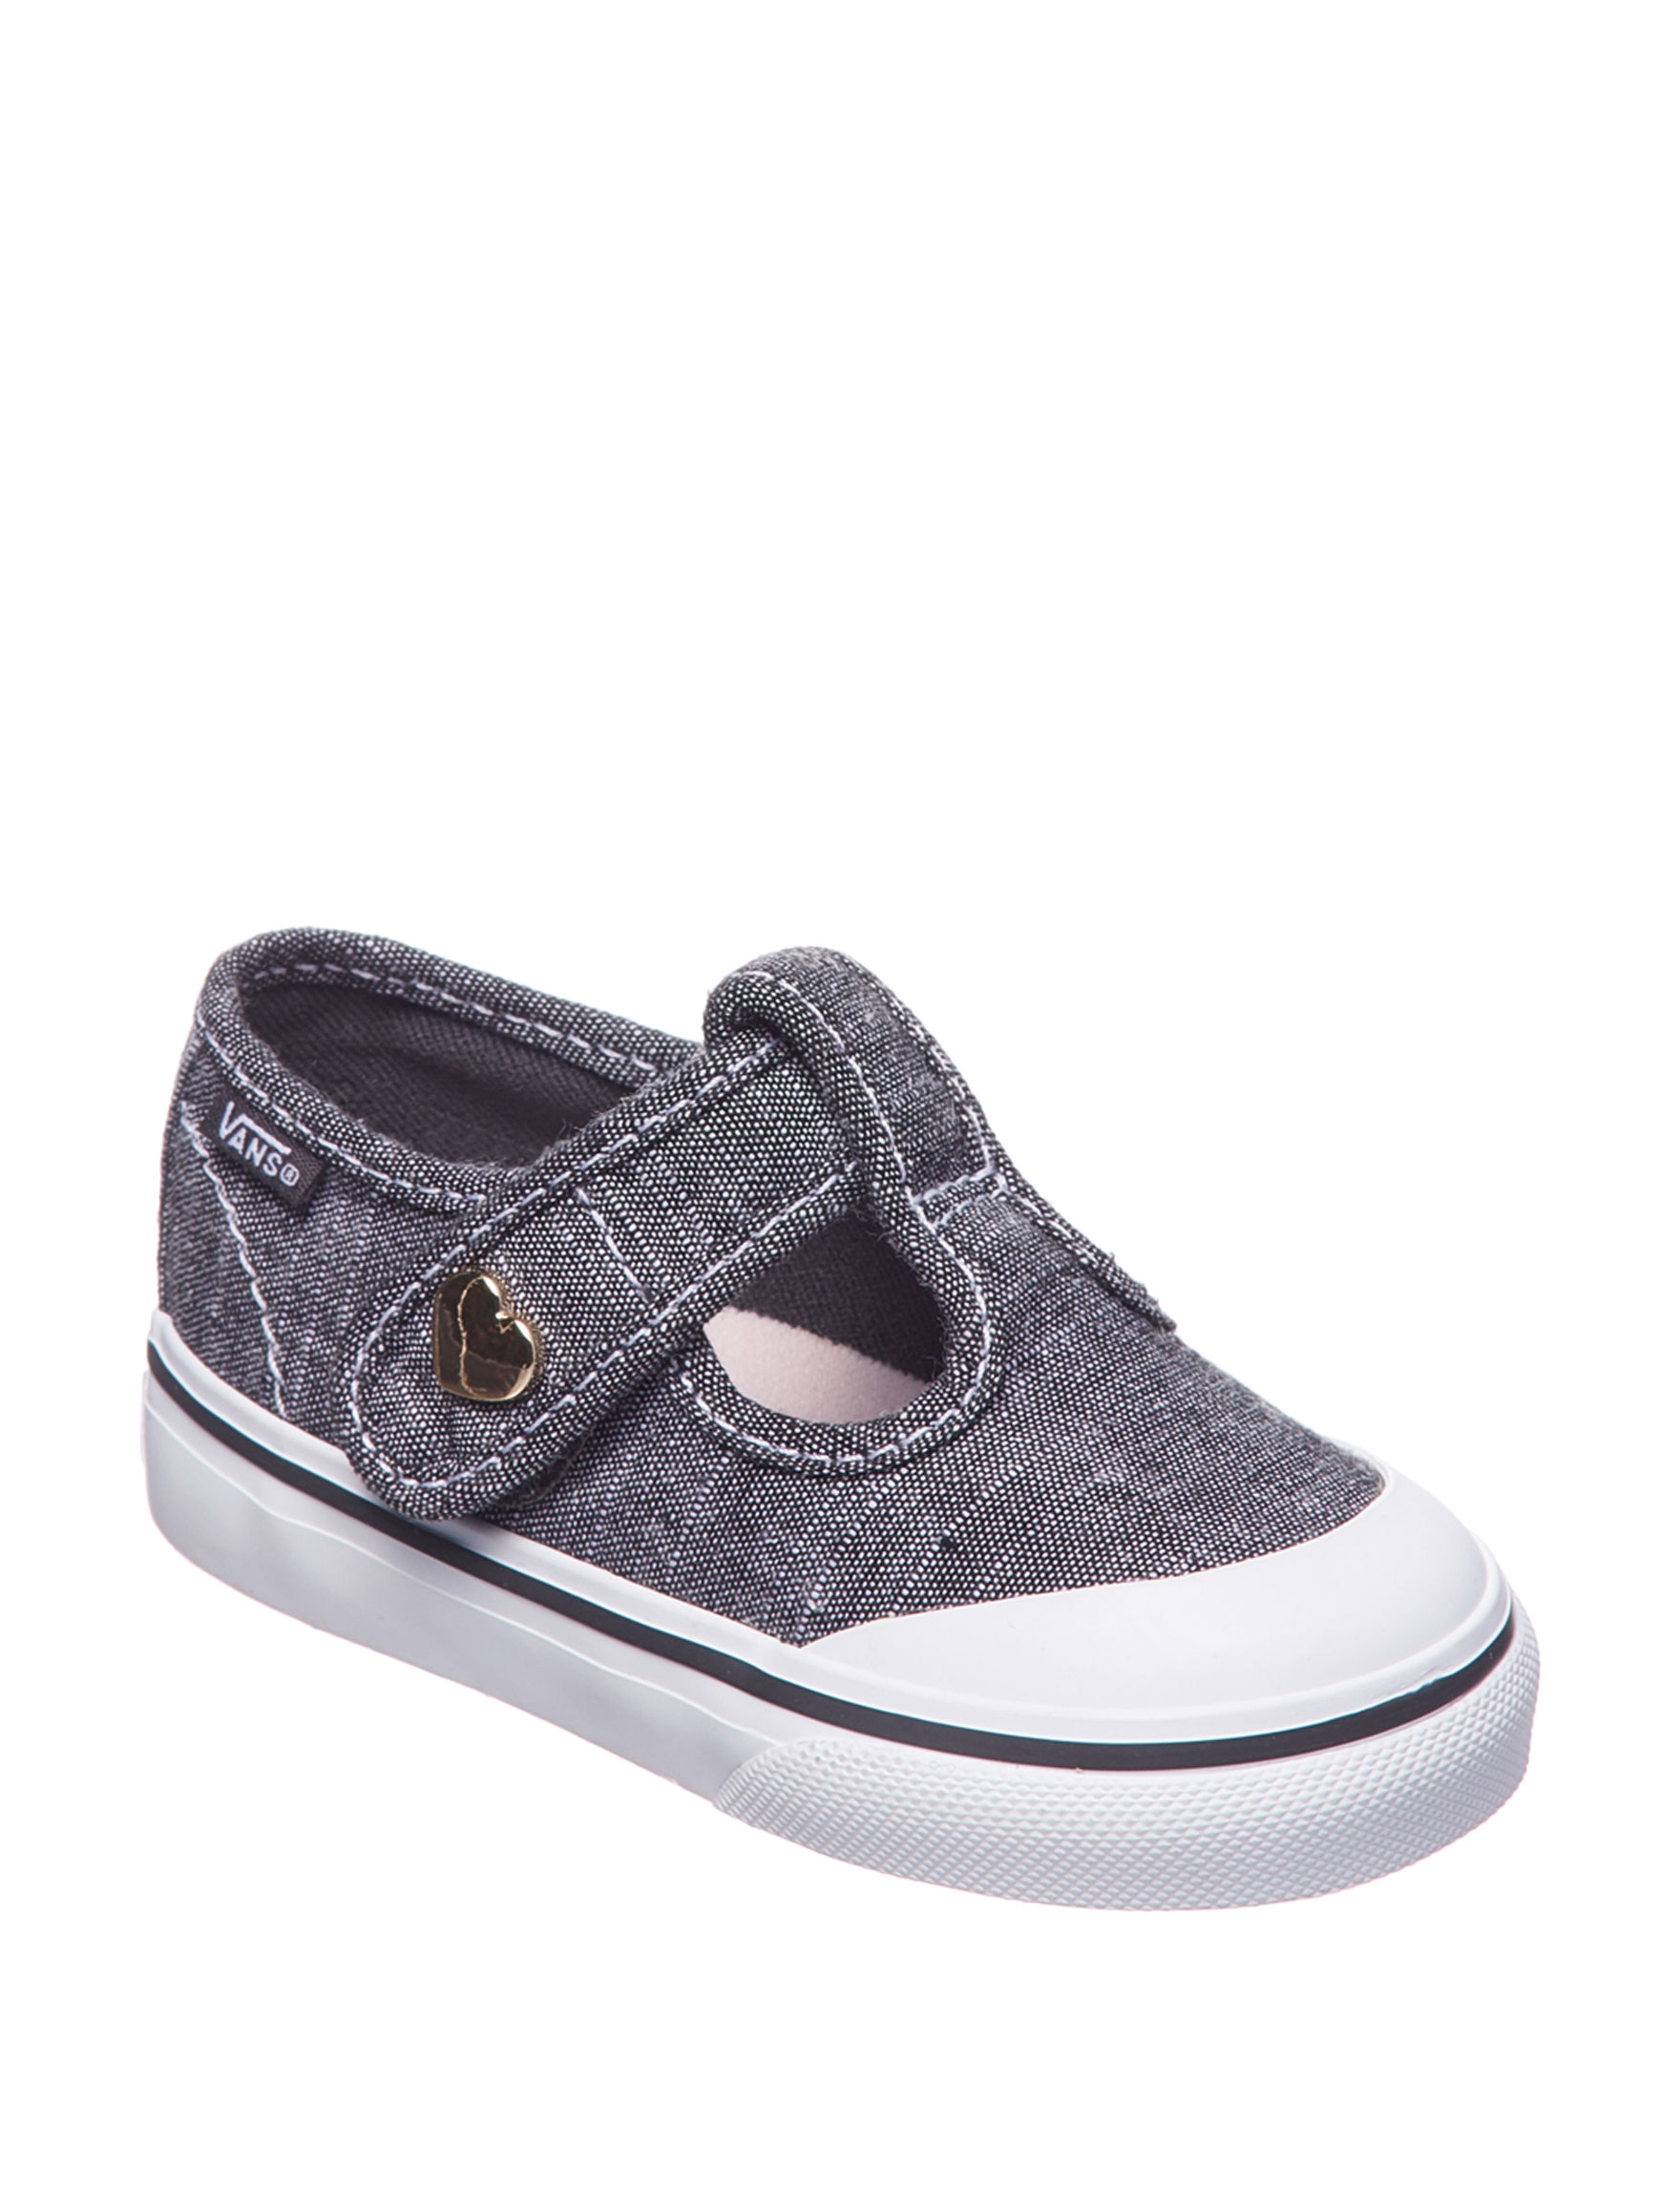 5bd4f92014 Vans Leena Casual Shoes - Toddler Girls 4-10